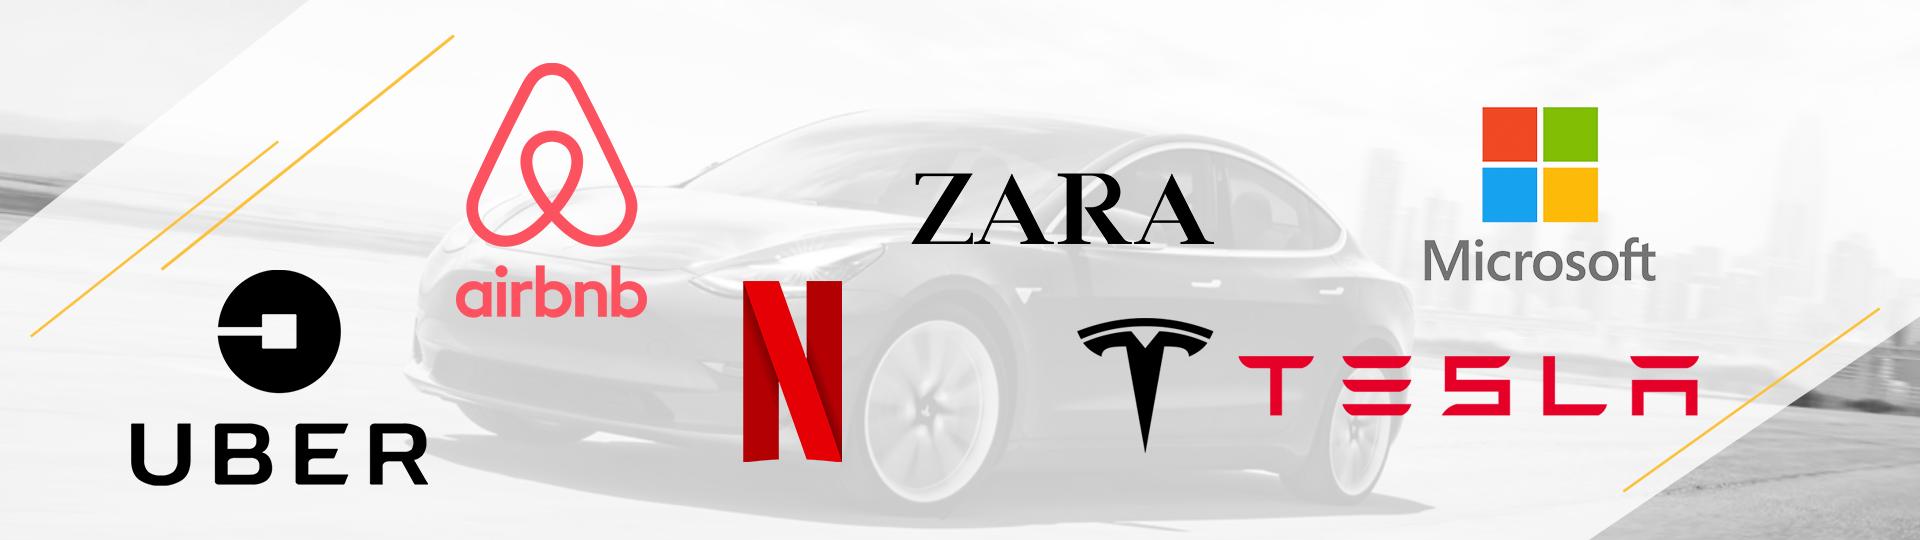 graphic2_logos